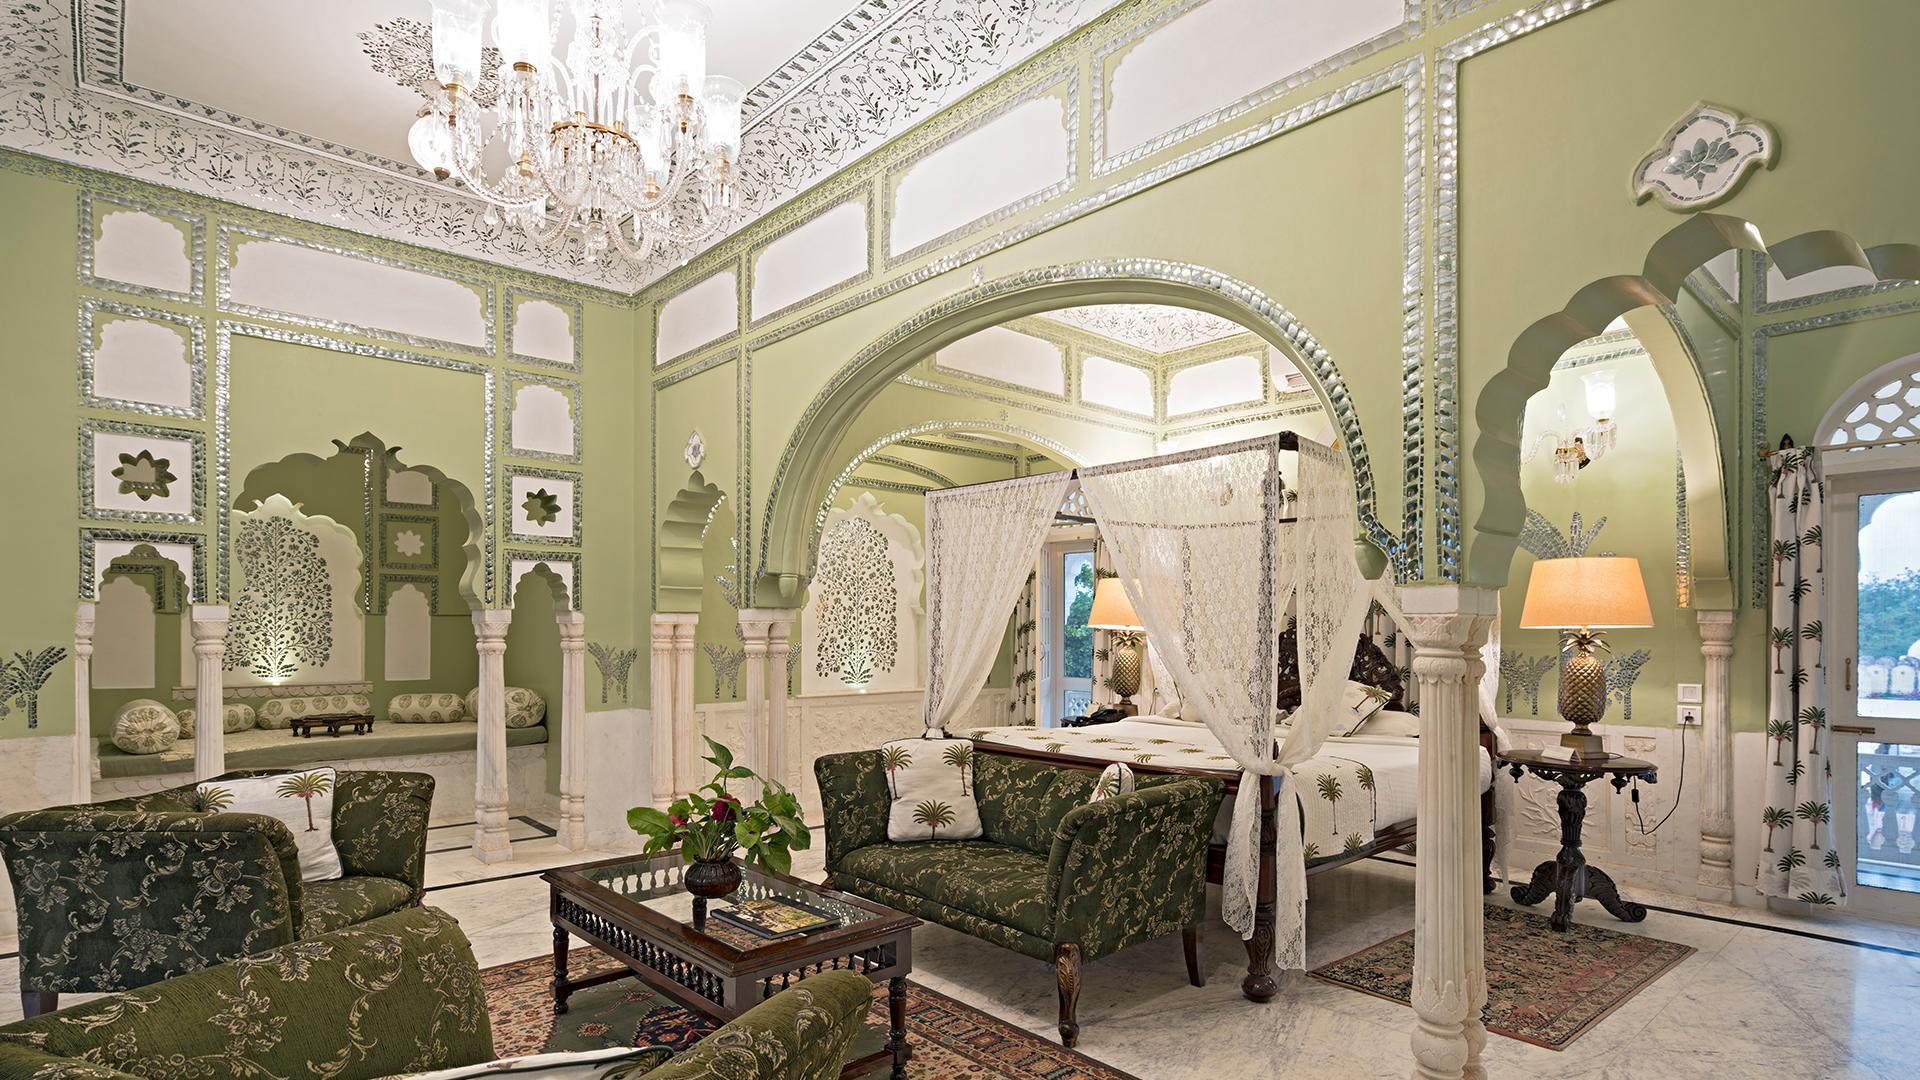 Super Deluxe Room image 1 at Nahargarh Ranthambhore by Sawai Madhopur, Rajasthan, India